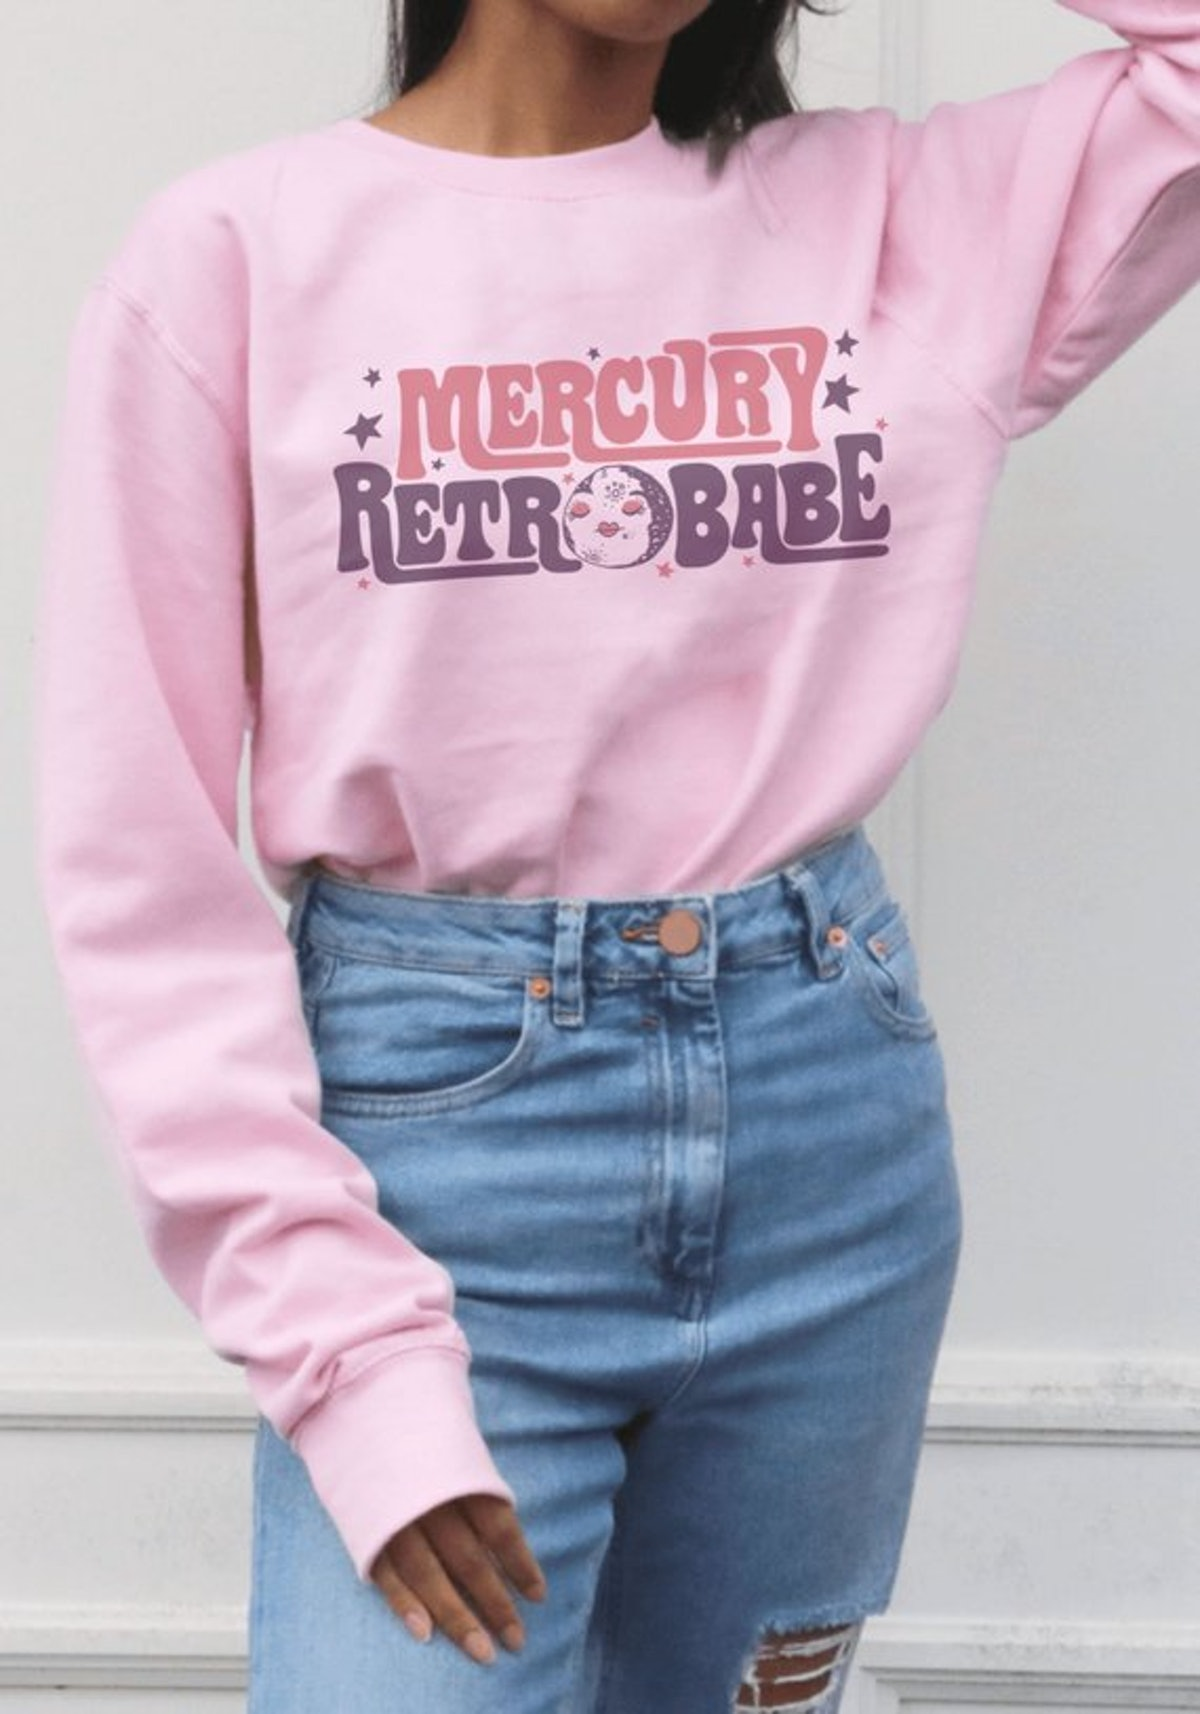 Mercury Retrobabe Sweatshirt